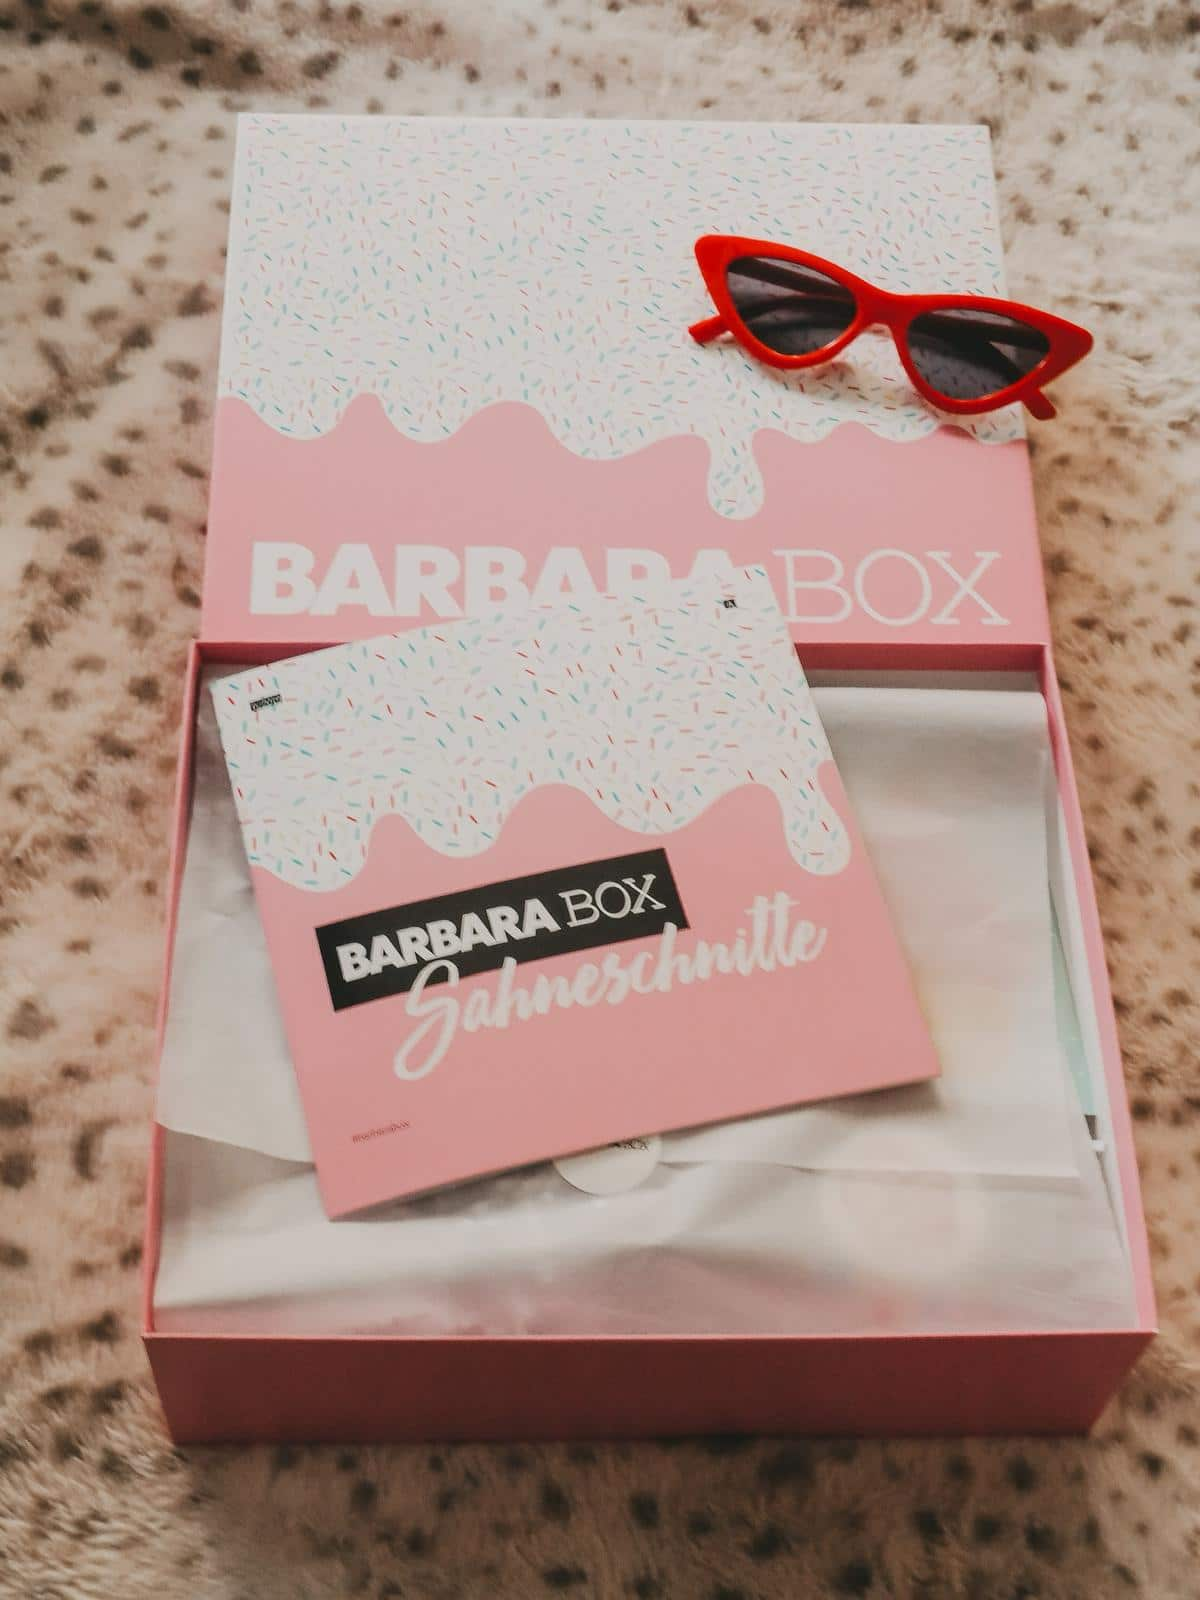 Die Barbara Box Sahneschnitte